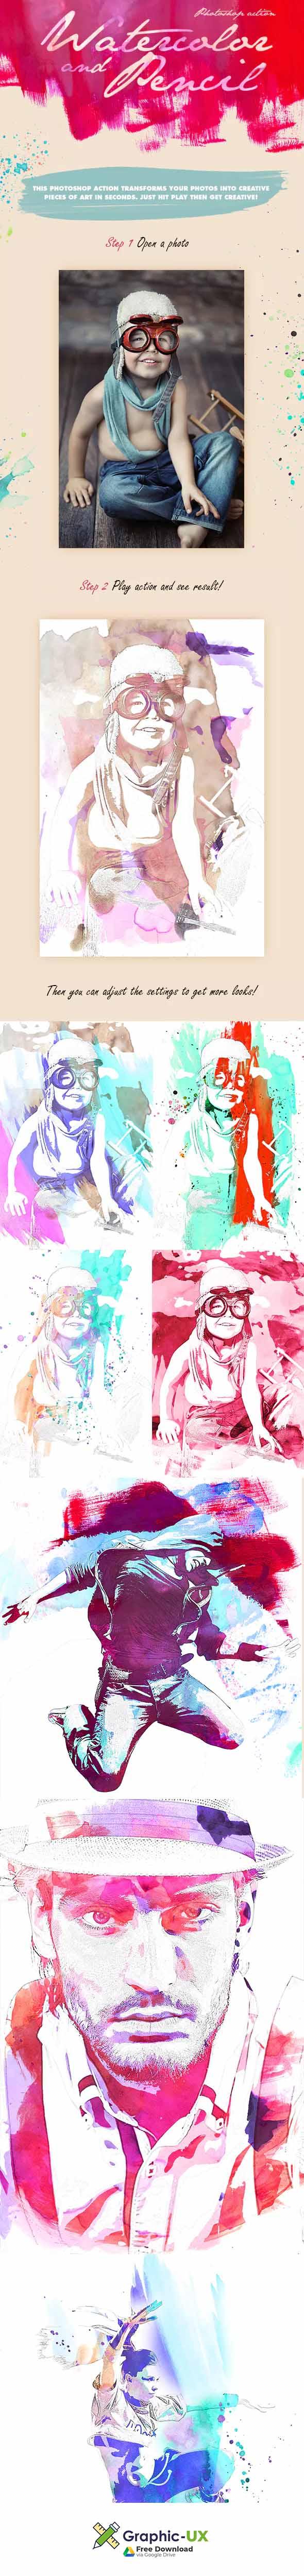 Pencil Sketch Art Photoshop Action Free Download